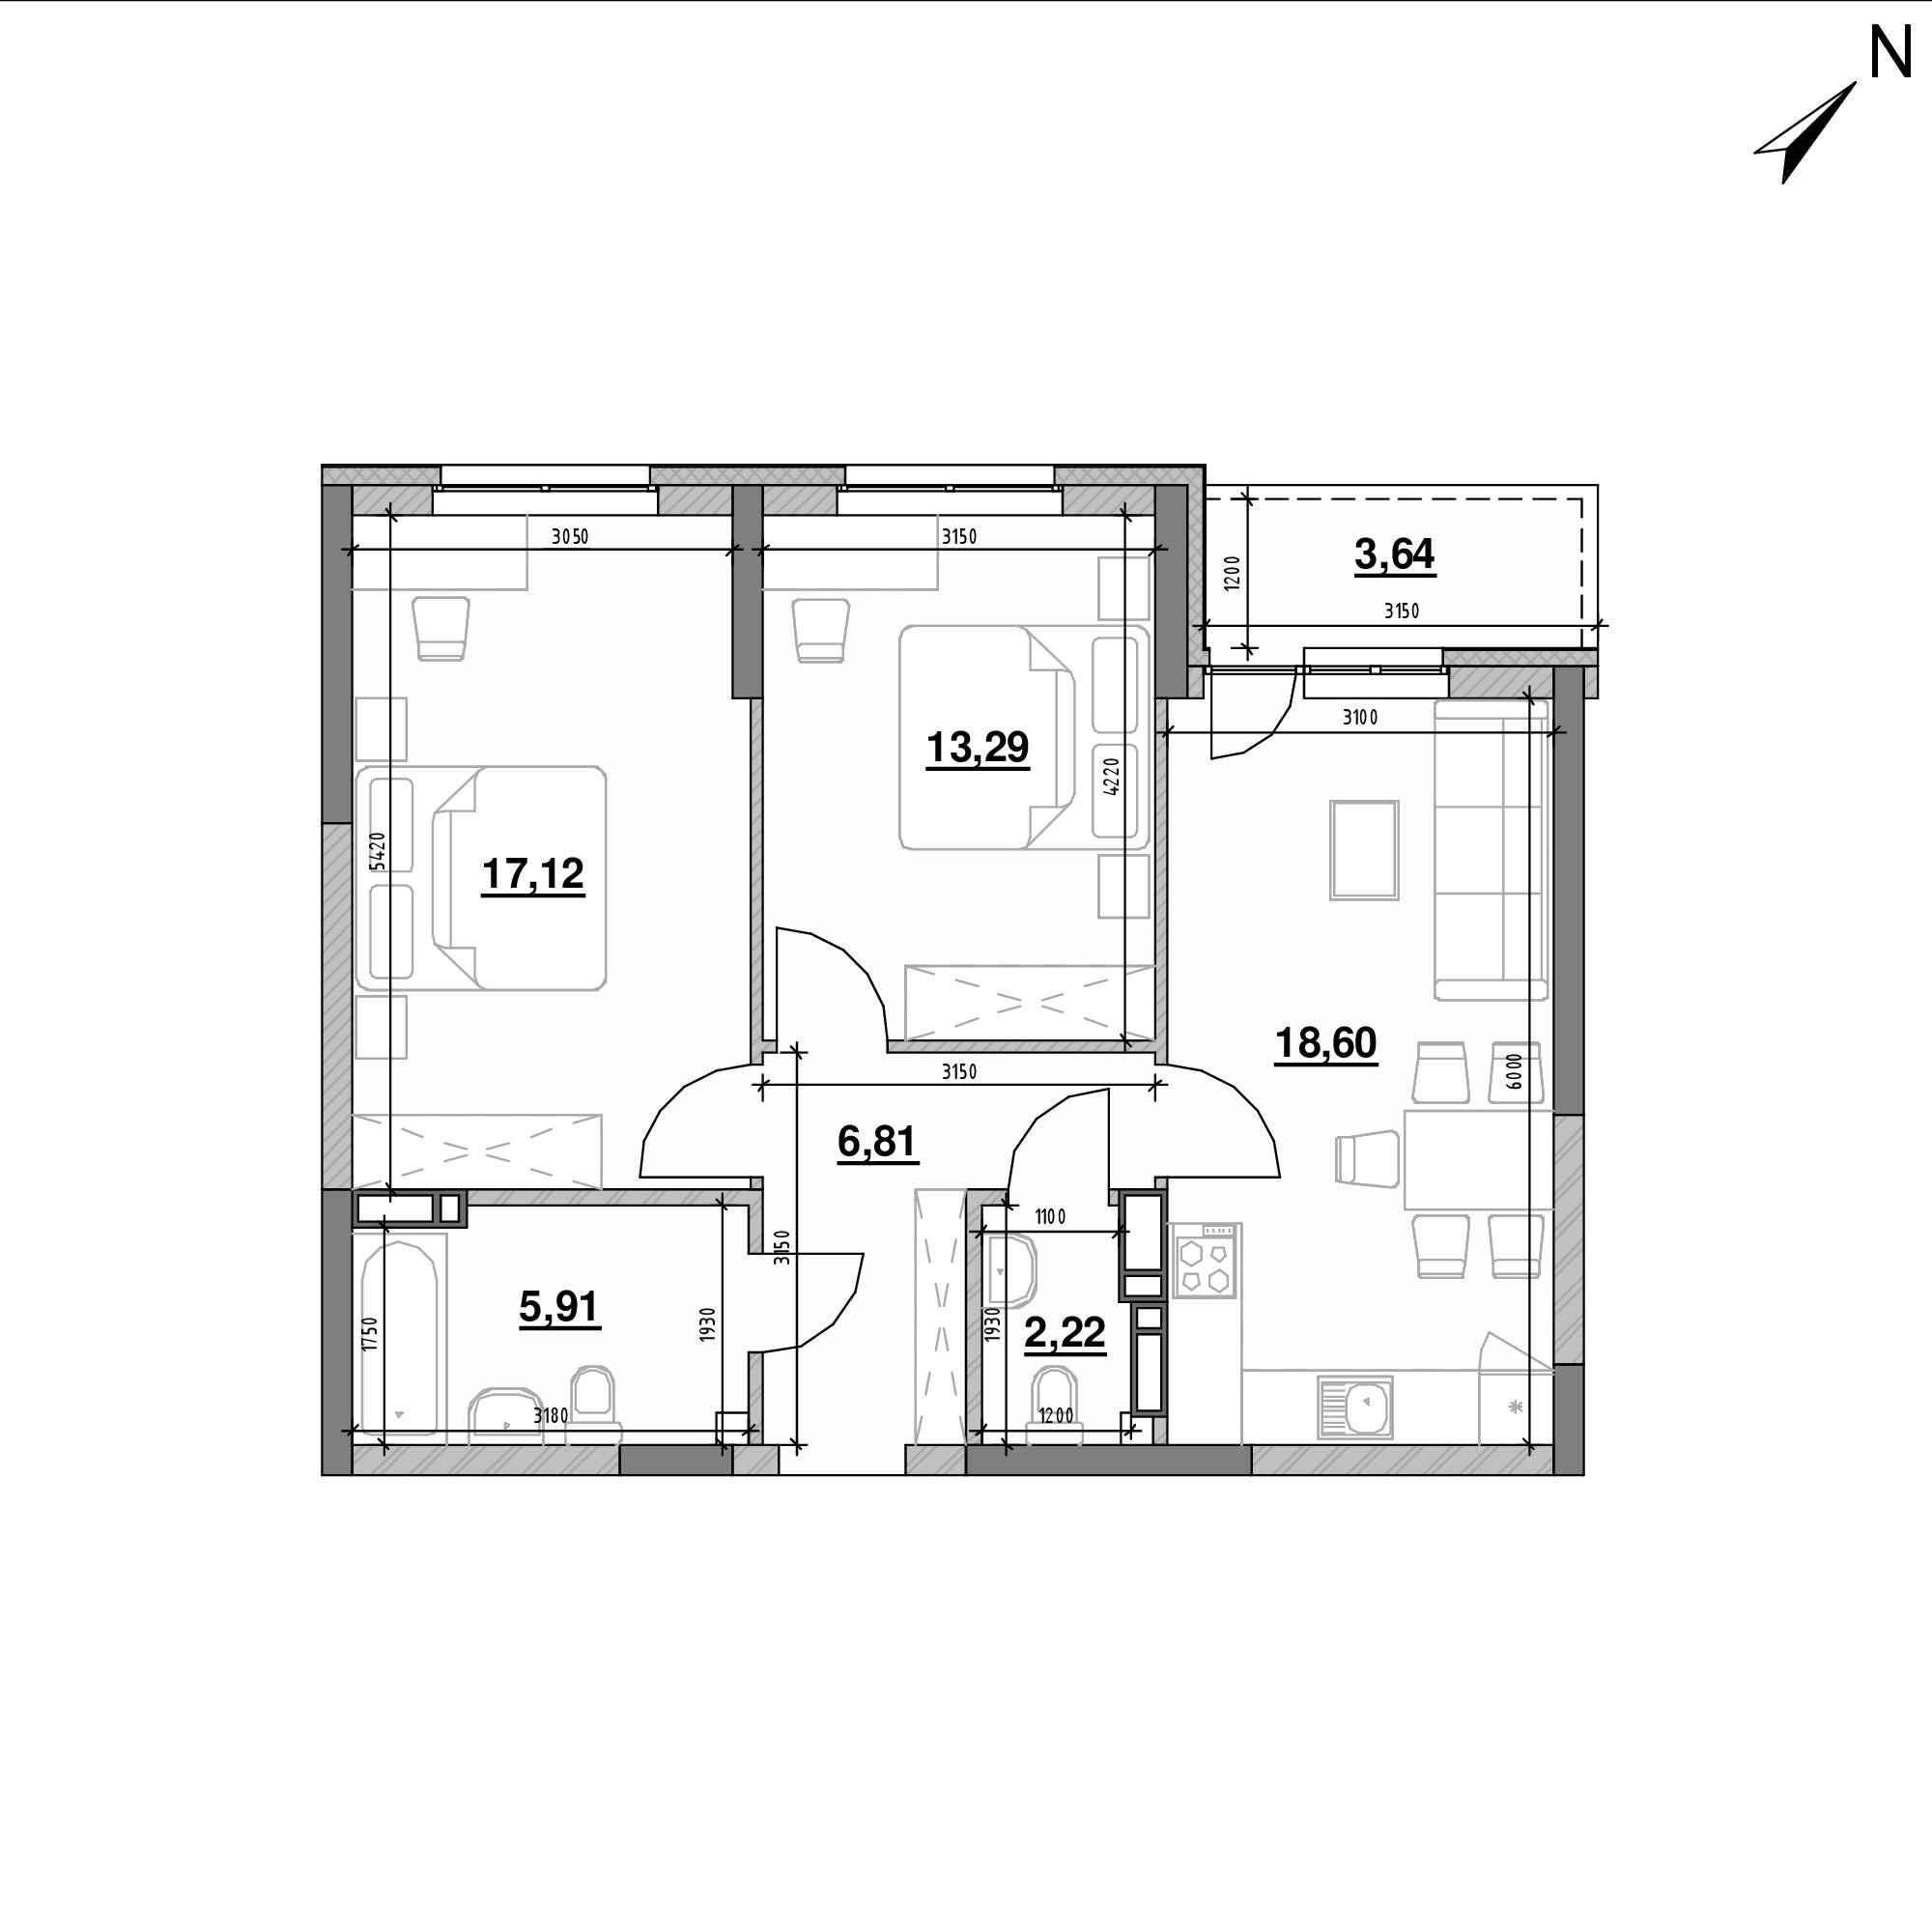 ЖК Оk'Land: планування 2-кімнатної квартири, №482, 67.59 м<sup>2</sup>